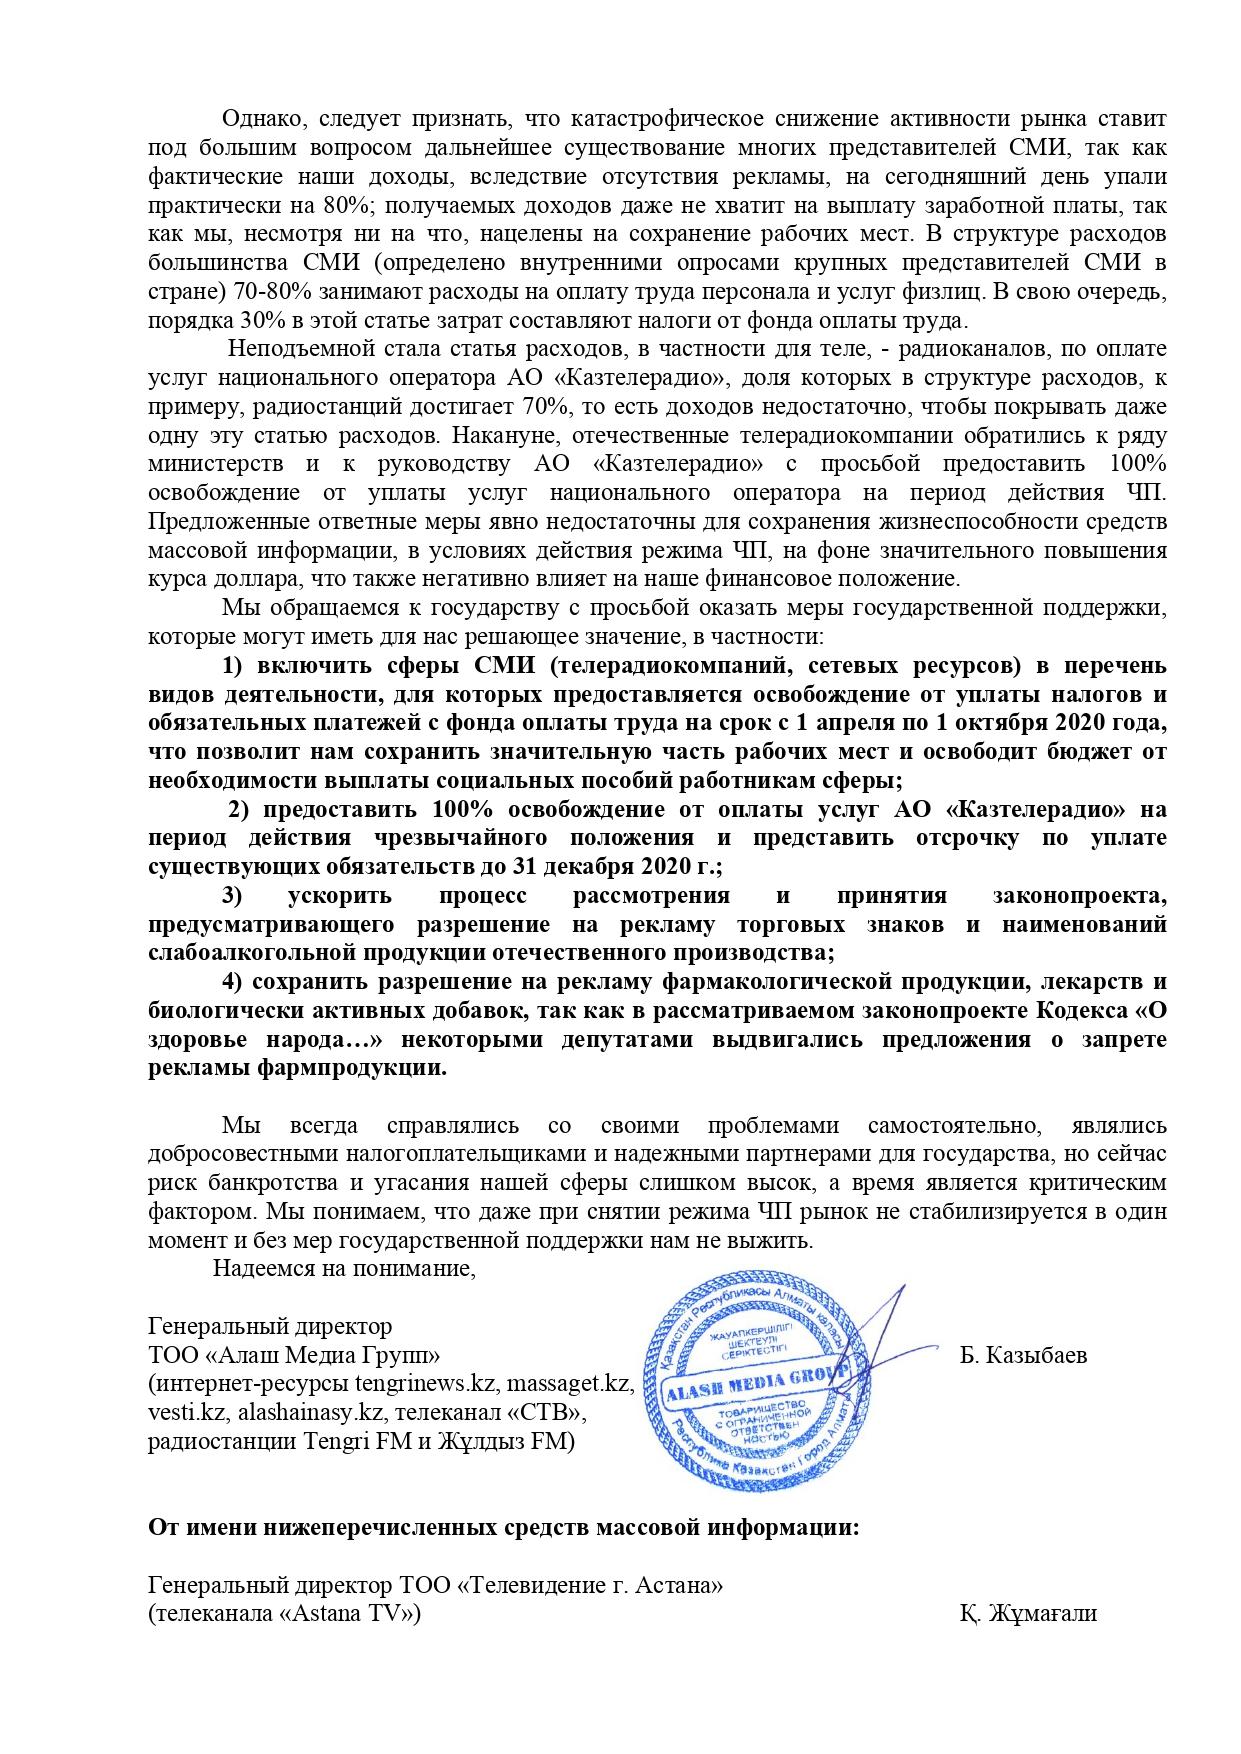 https://inbusiness.kz/ru/images/original/31/images/OrFYooPX.jpg